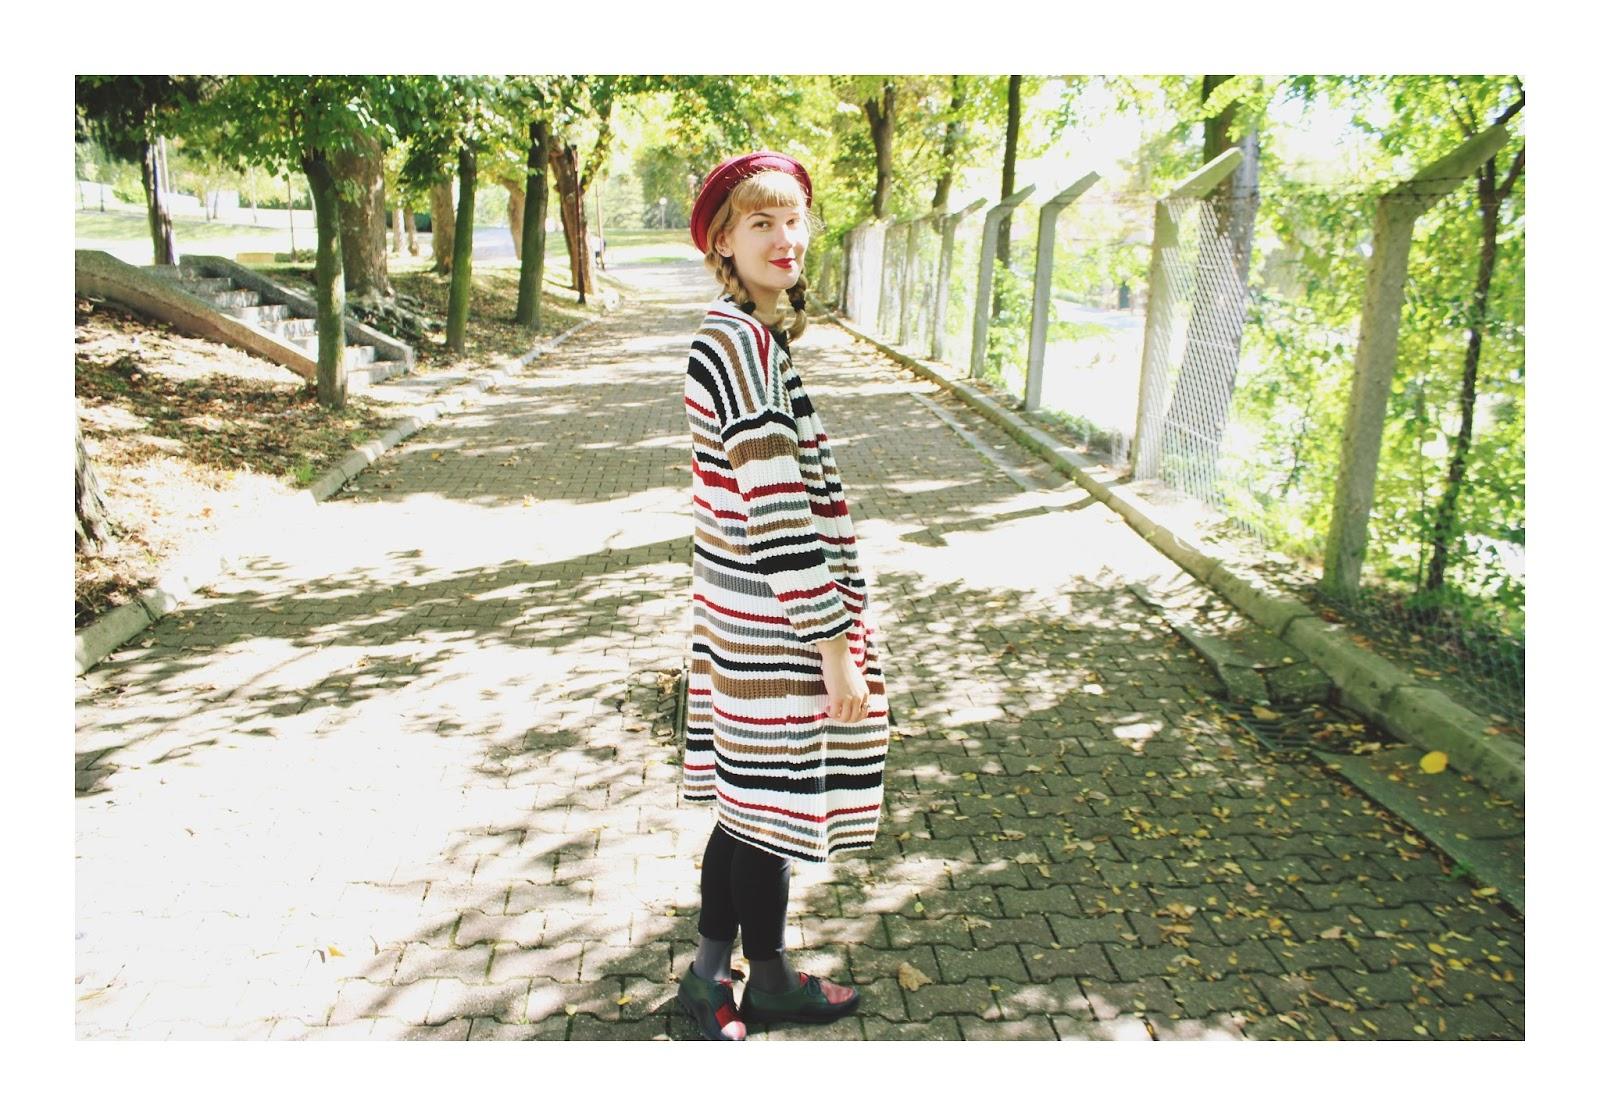 filipa canic, youarethepoet, filipa canic blog, you are the poet blog, dresslily, dresslily fashion clothes,